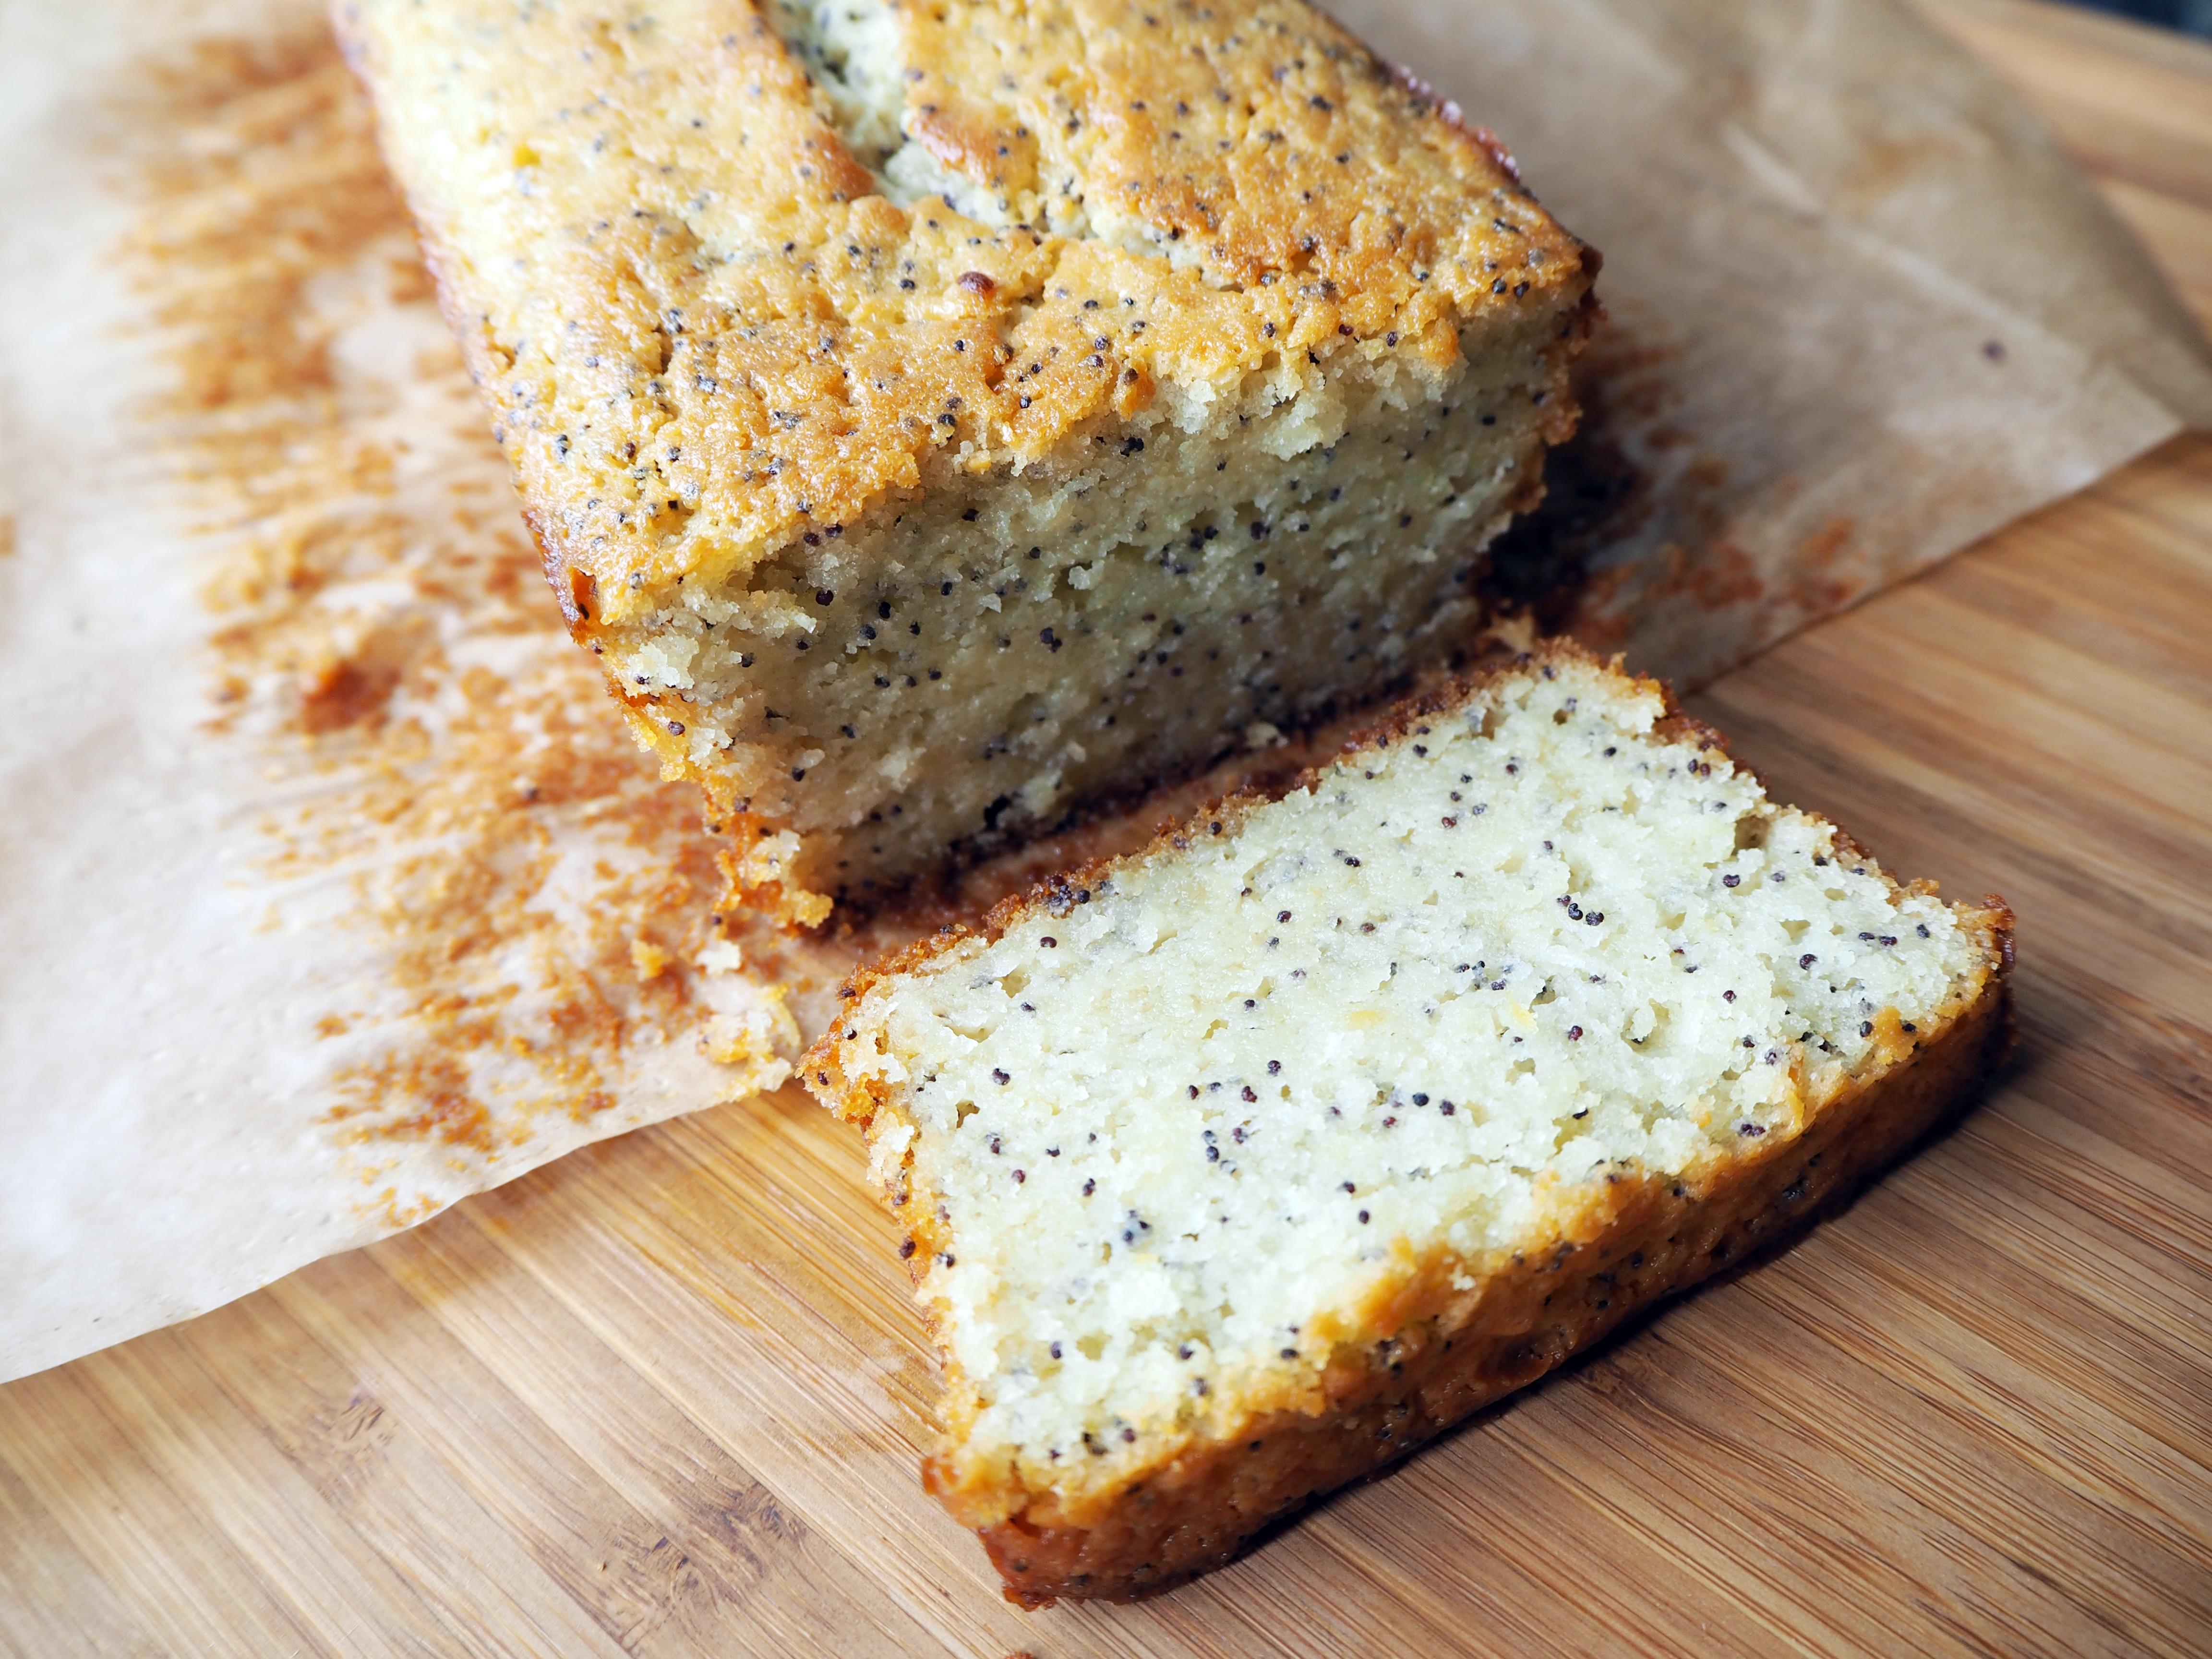 Bbc Recipes Lemon And Poppy Seed Cake